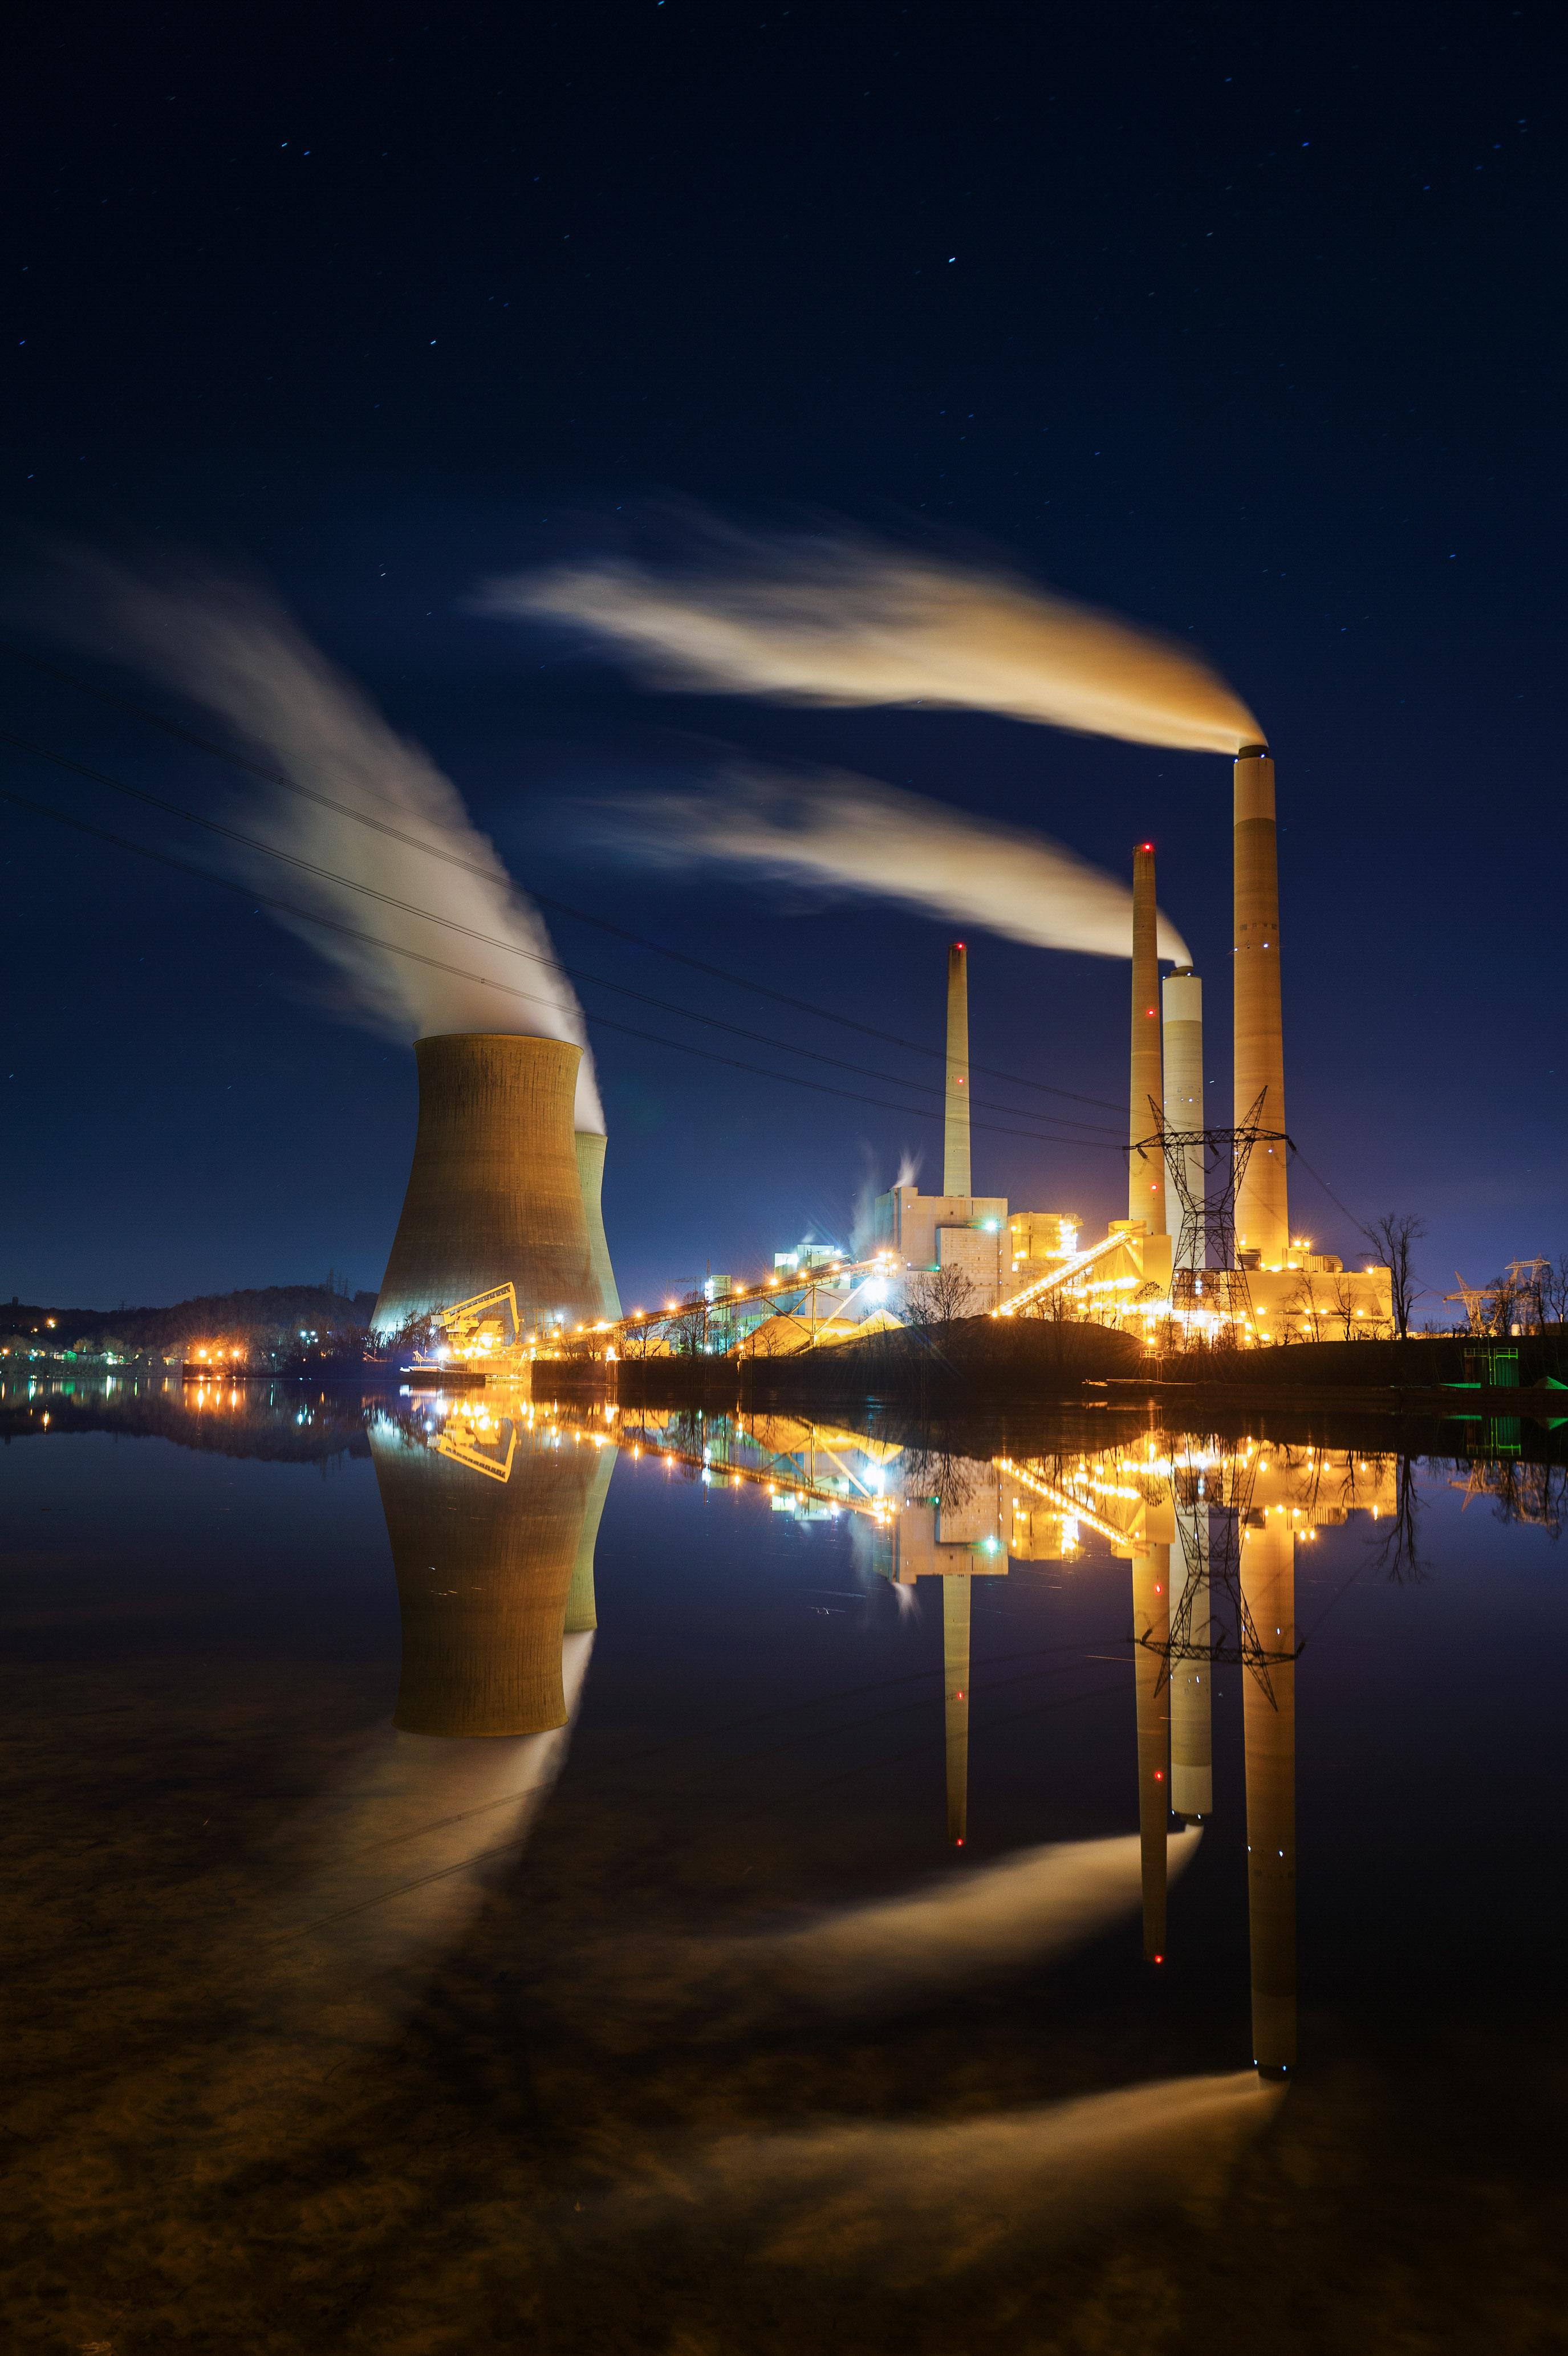 John Amos Power Plant from across the Kanawha River. Poca, WV